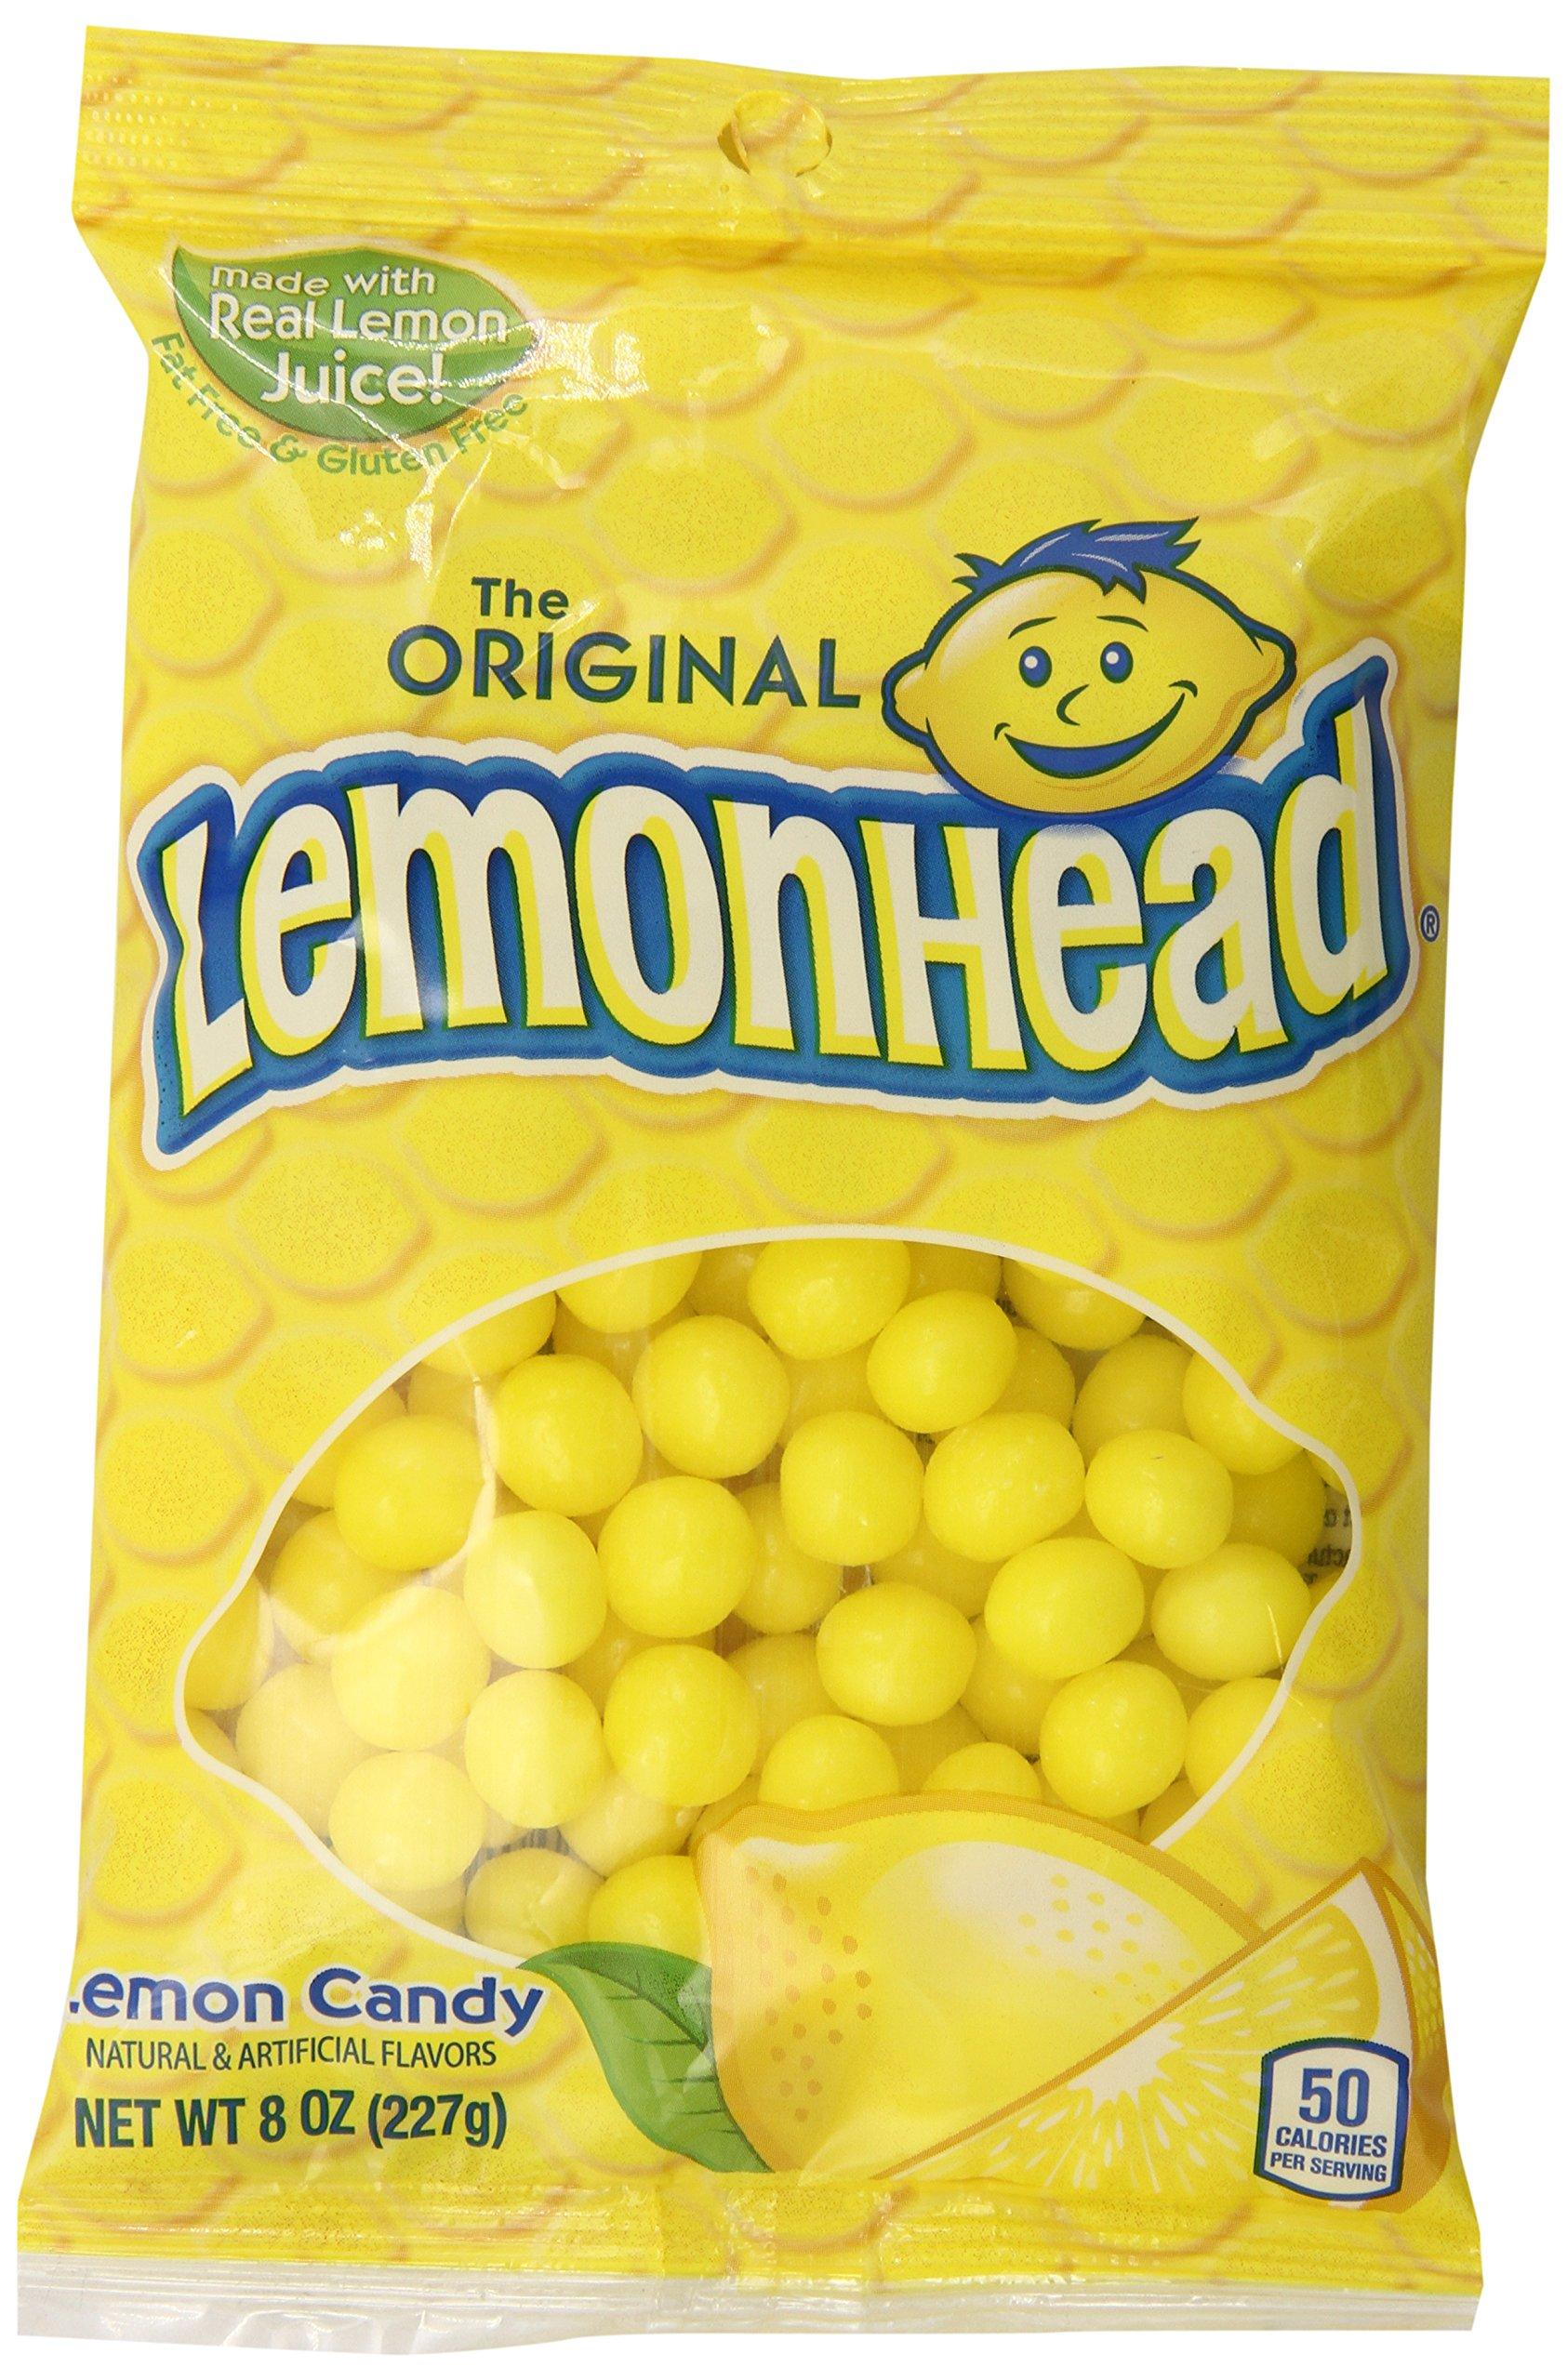 Lemonhead Hard Candy, Lemon, 8 Ounce Bag, Pack of 12 by Ferrara Pan